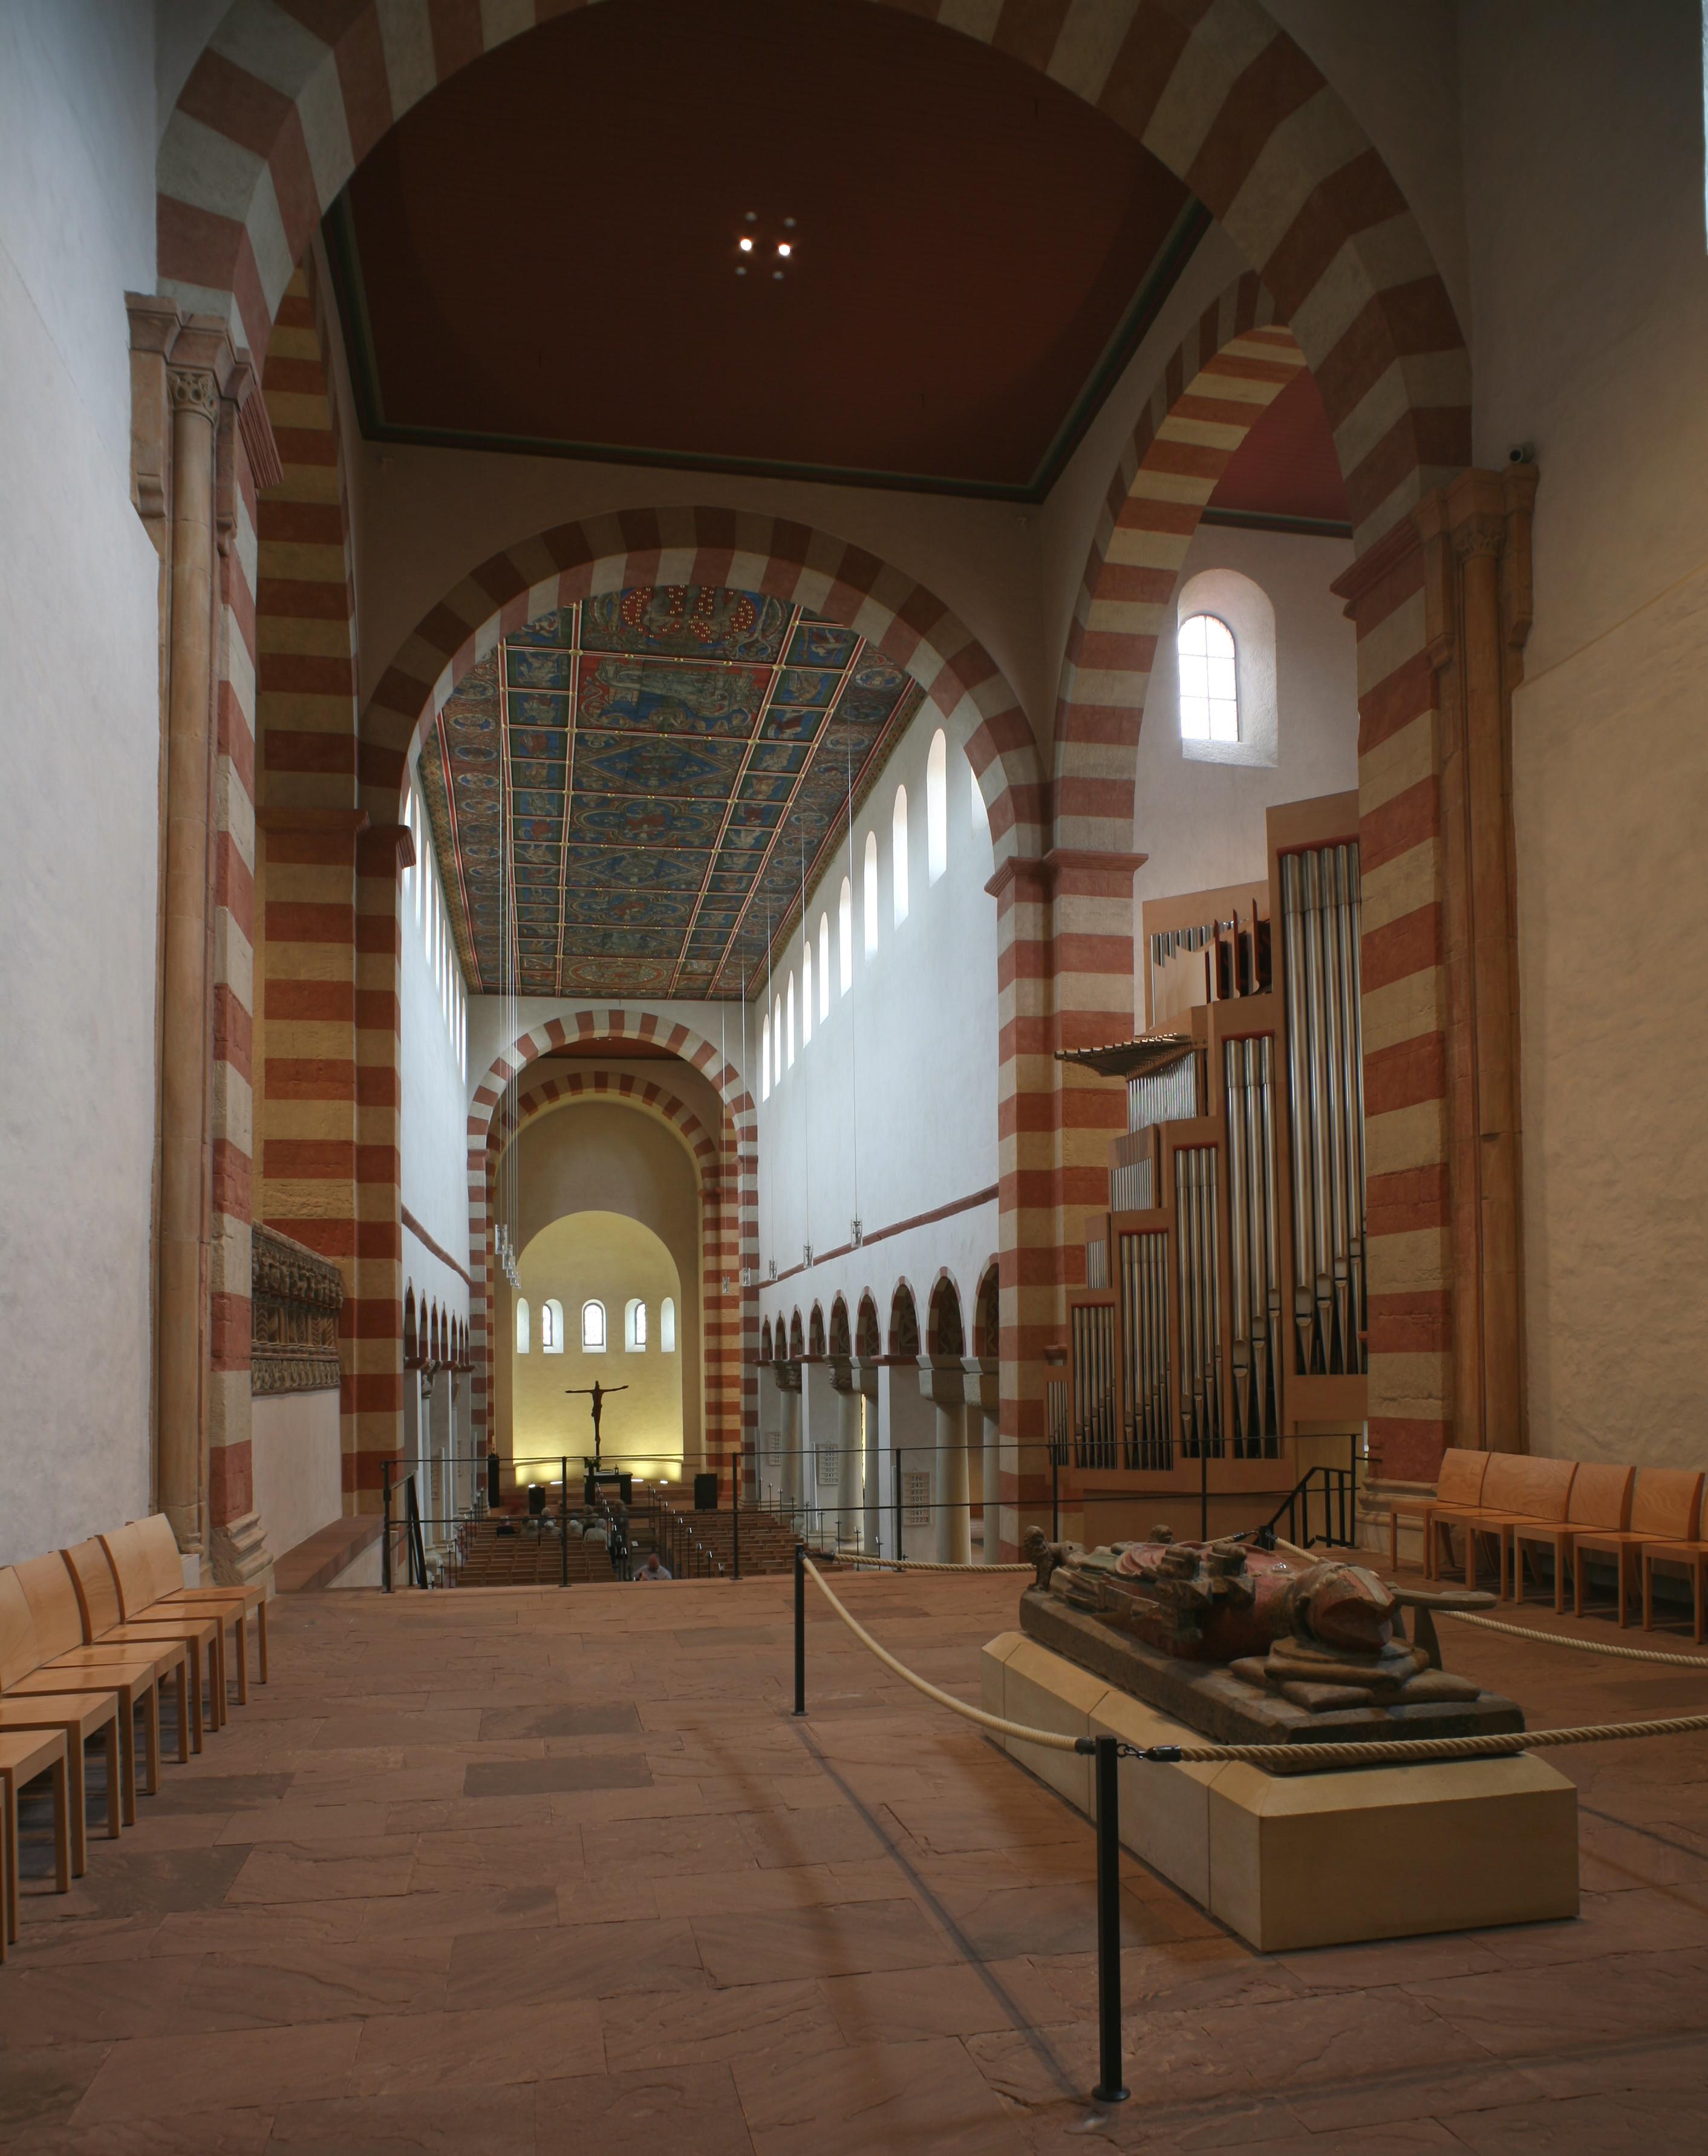 saint michael s church hildesheim jong soung kimm via. Black Bedroom Furniture Sets. Home Design Ideas